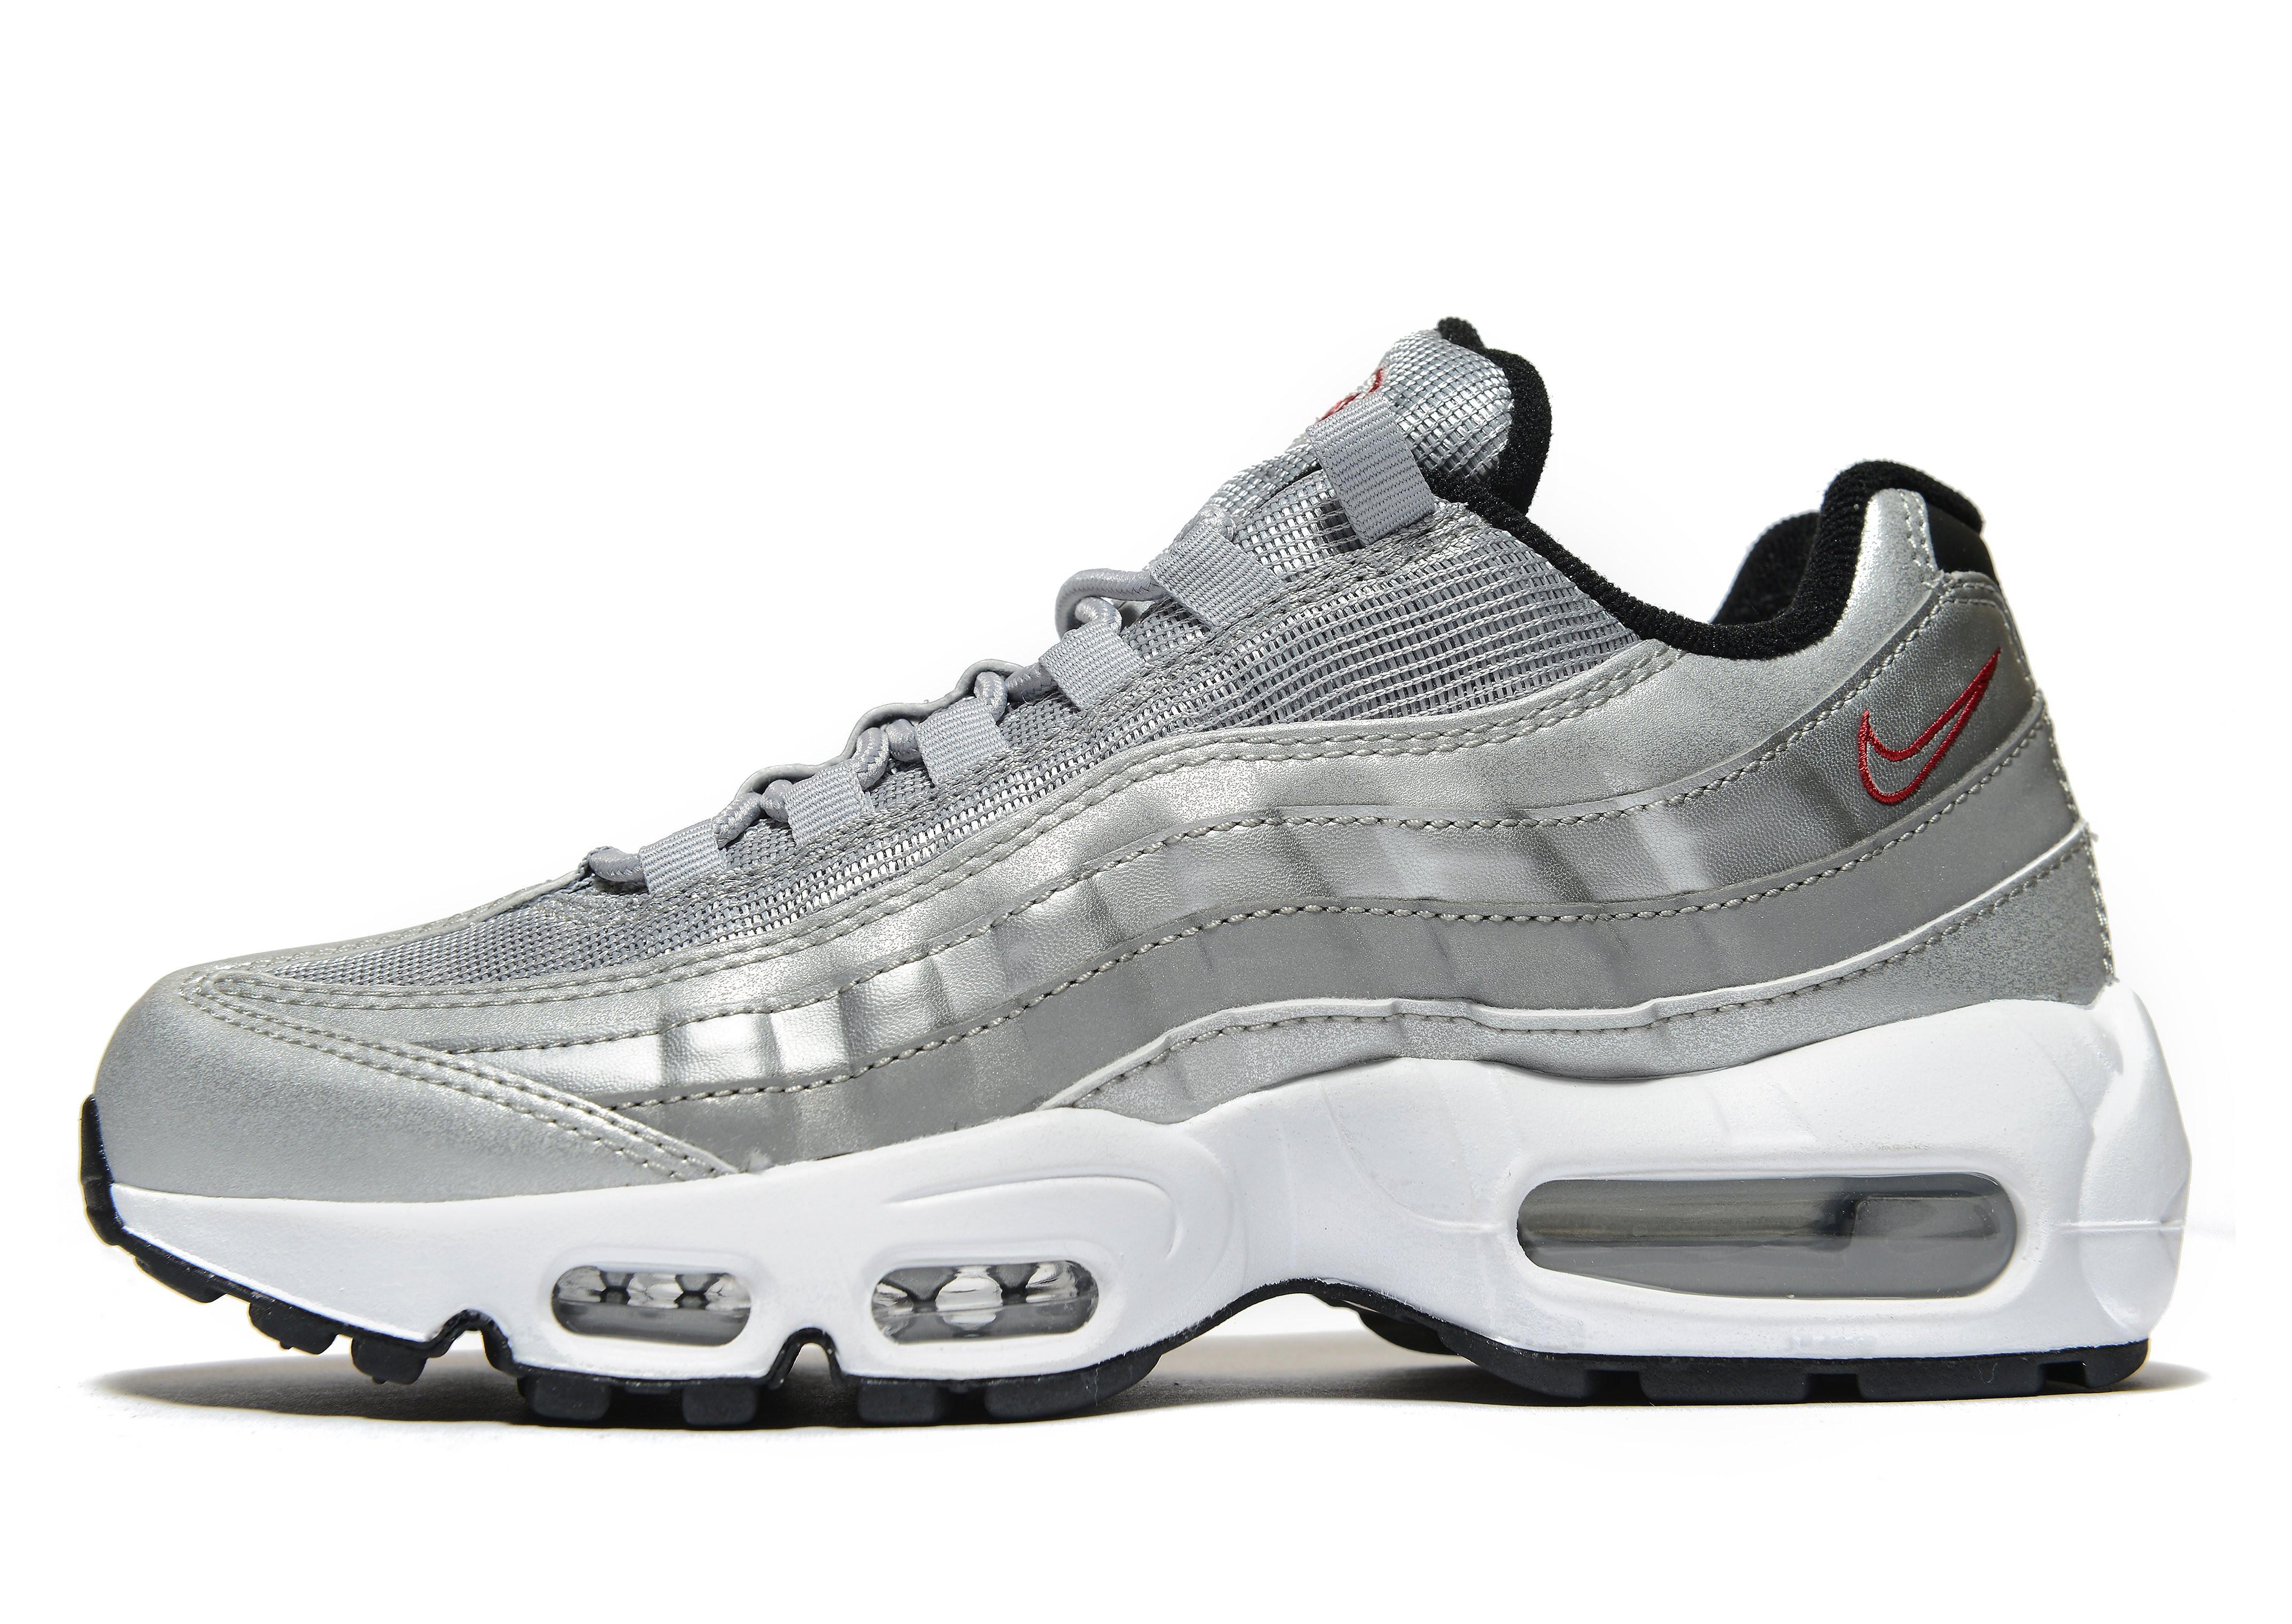 Nike Air Max 95 OG Dames